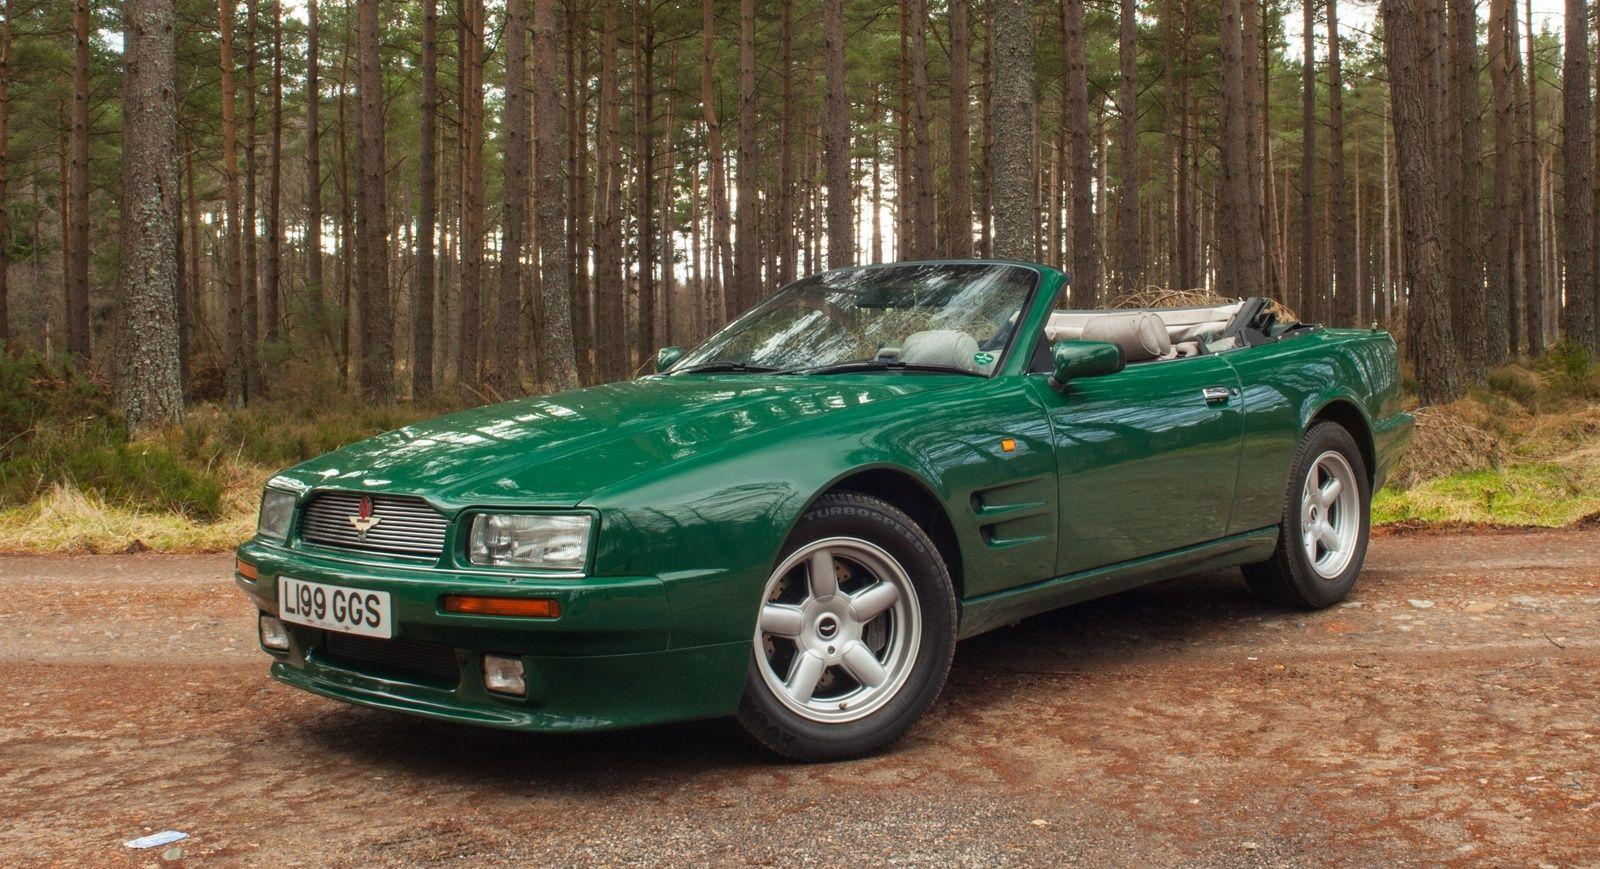 1994 Aston Martin Virage Virage Volante 6 3 Ex Hrh Prince Of Wales Classic Driver Market Aston Martin Virage Aston Martin Classic Cars